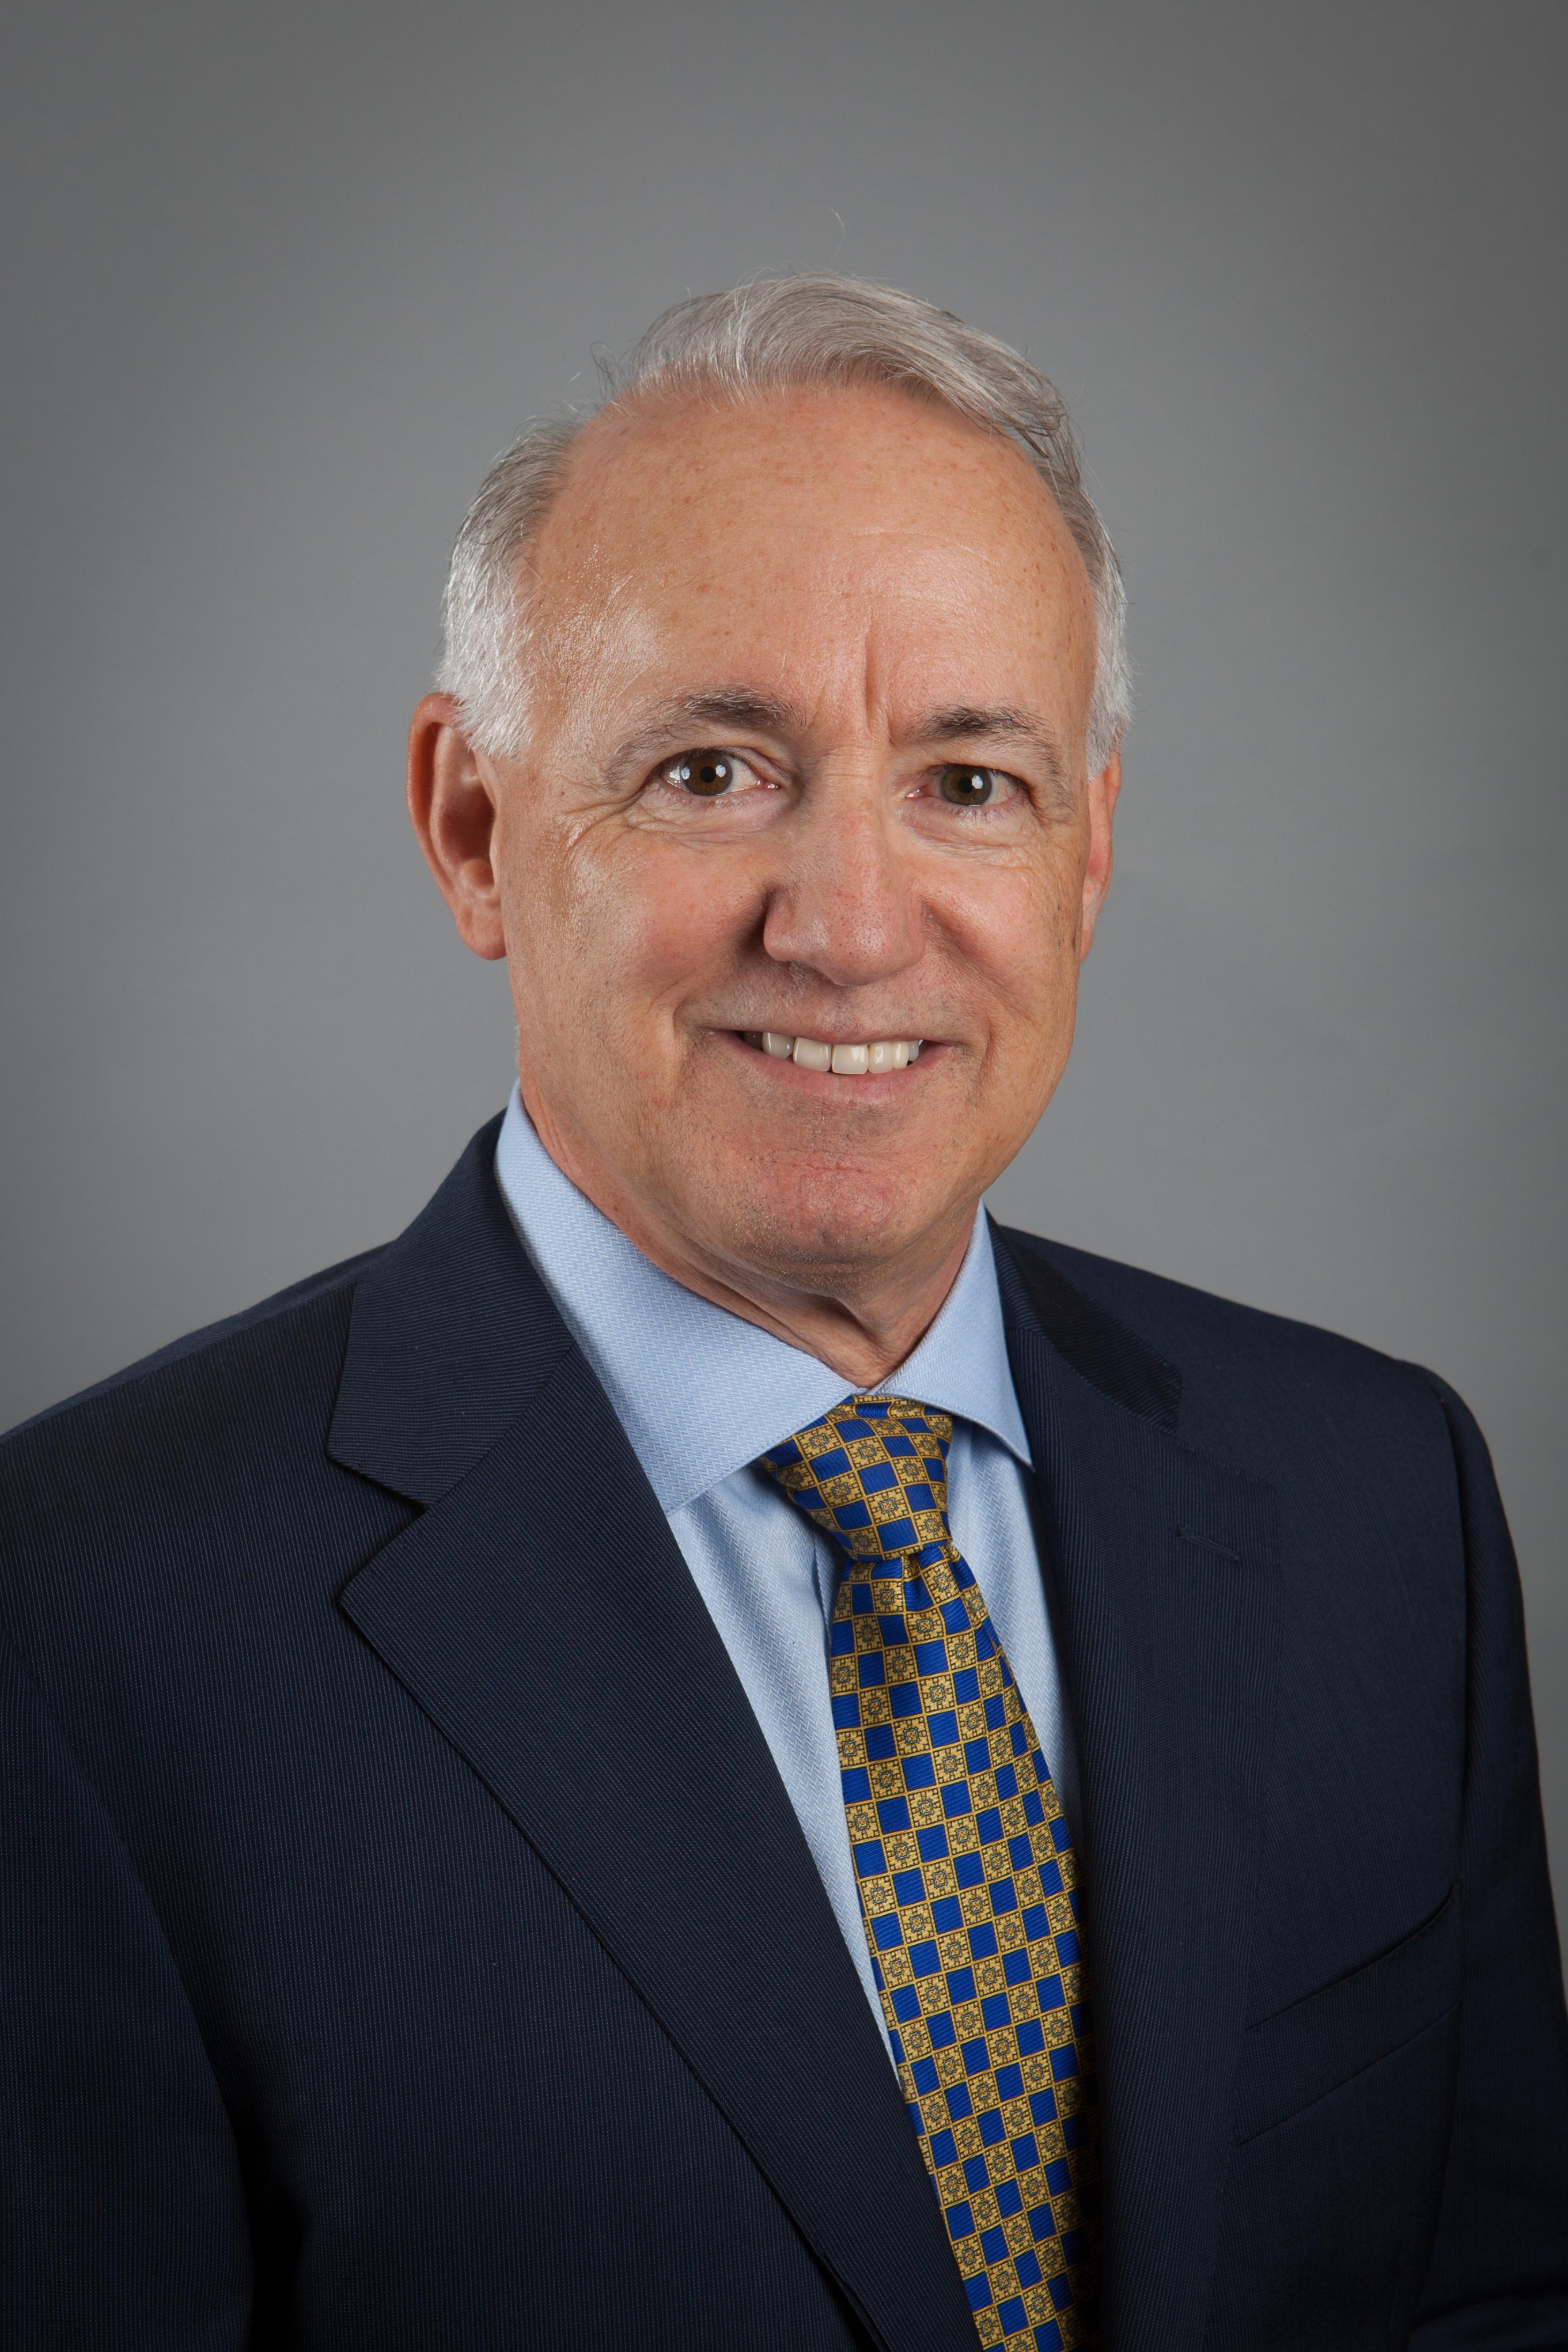 Mark D. LeBlanc